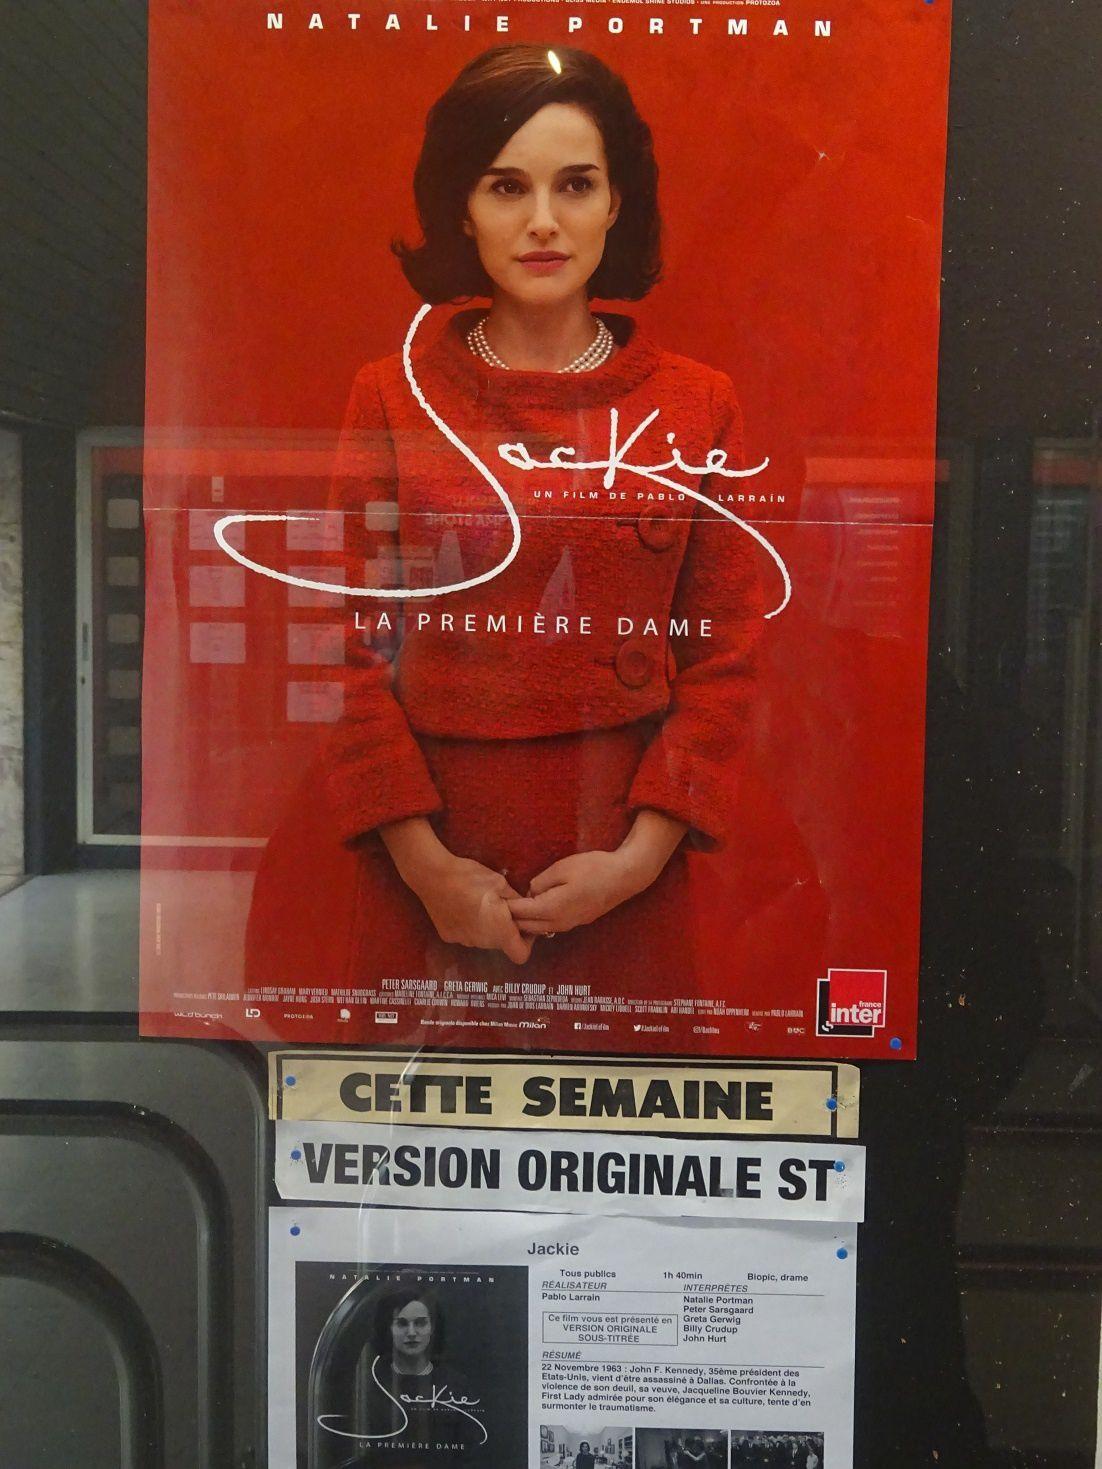 """Jackie"" - Film de pablo larrain - Cinéma Rialto - Nice  ©Théodore Charles/un-culte-d-art.overblog.com"